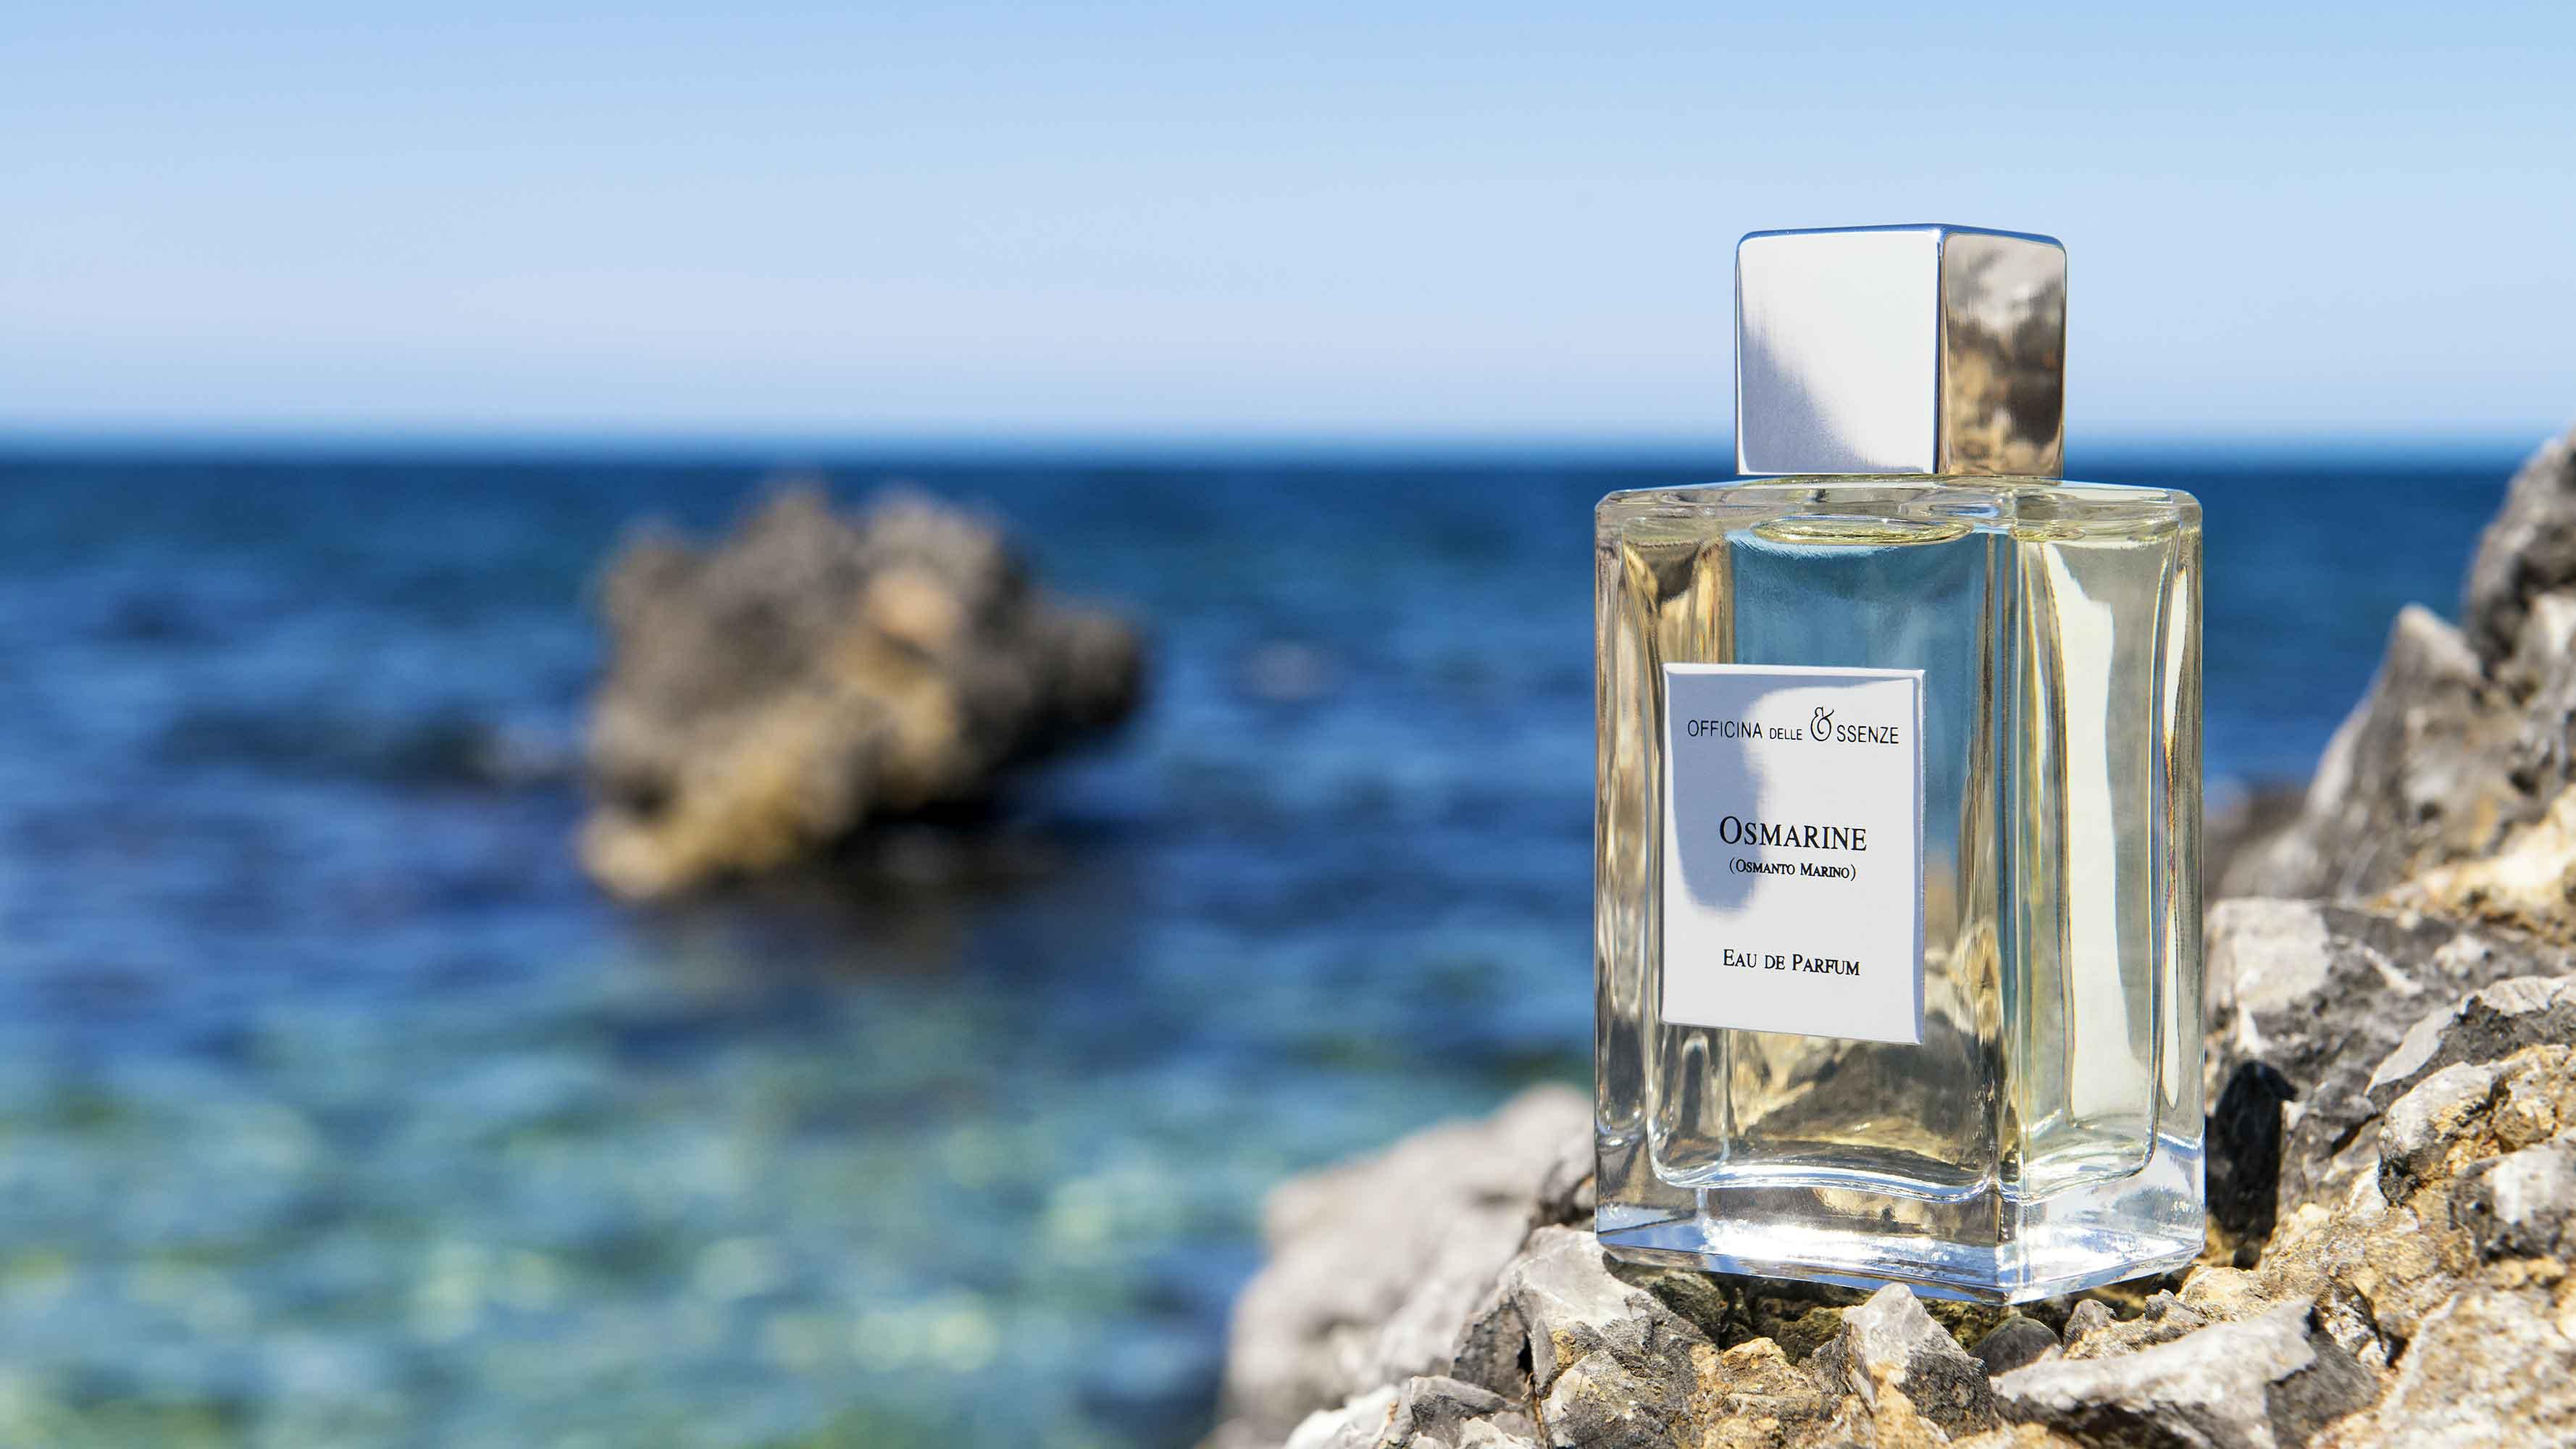 Osmarine Eau de Parfum summer